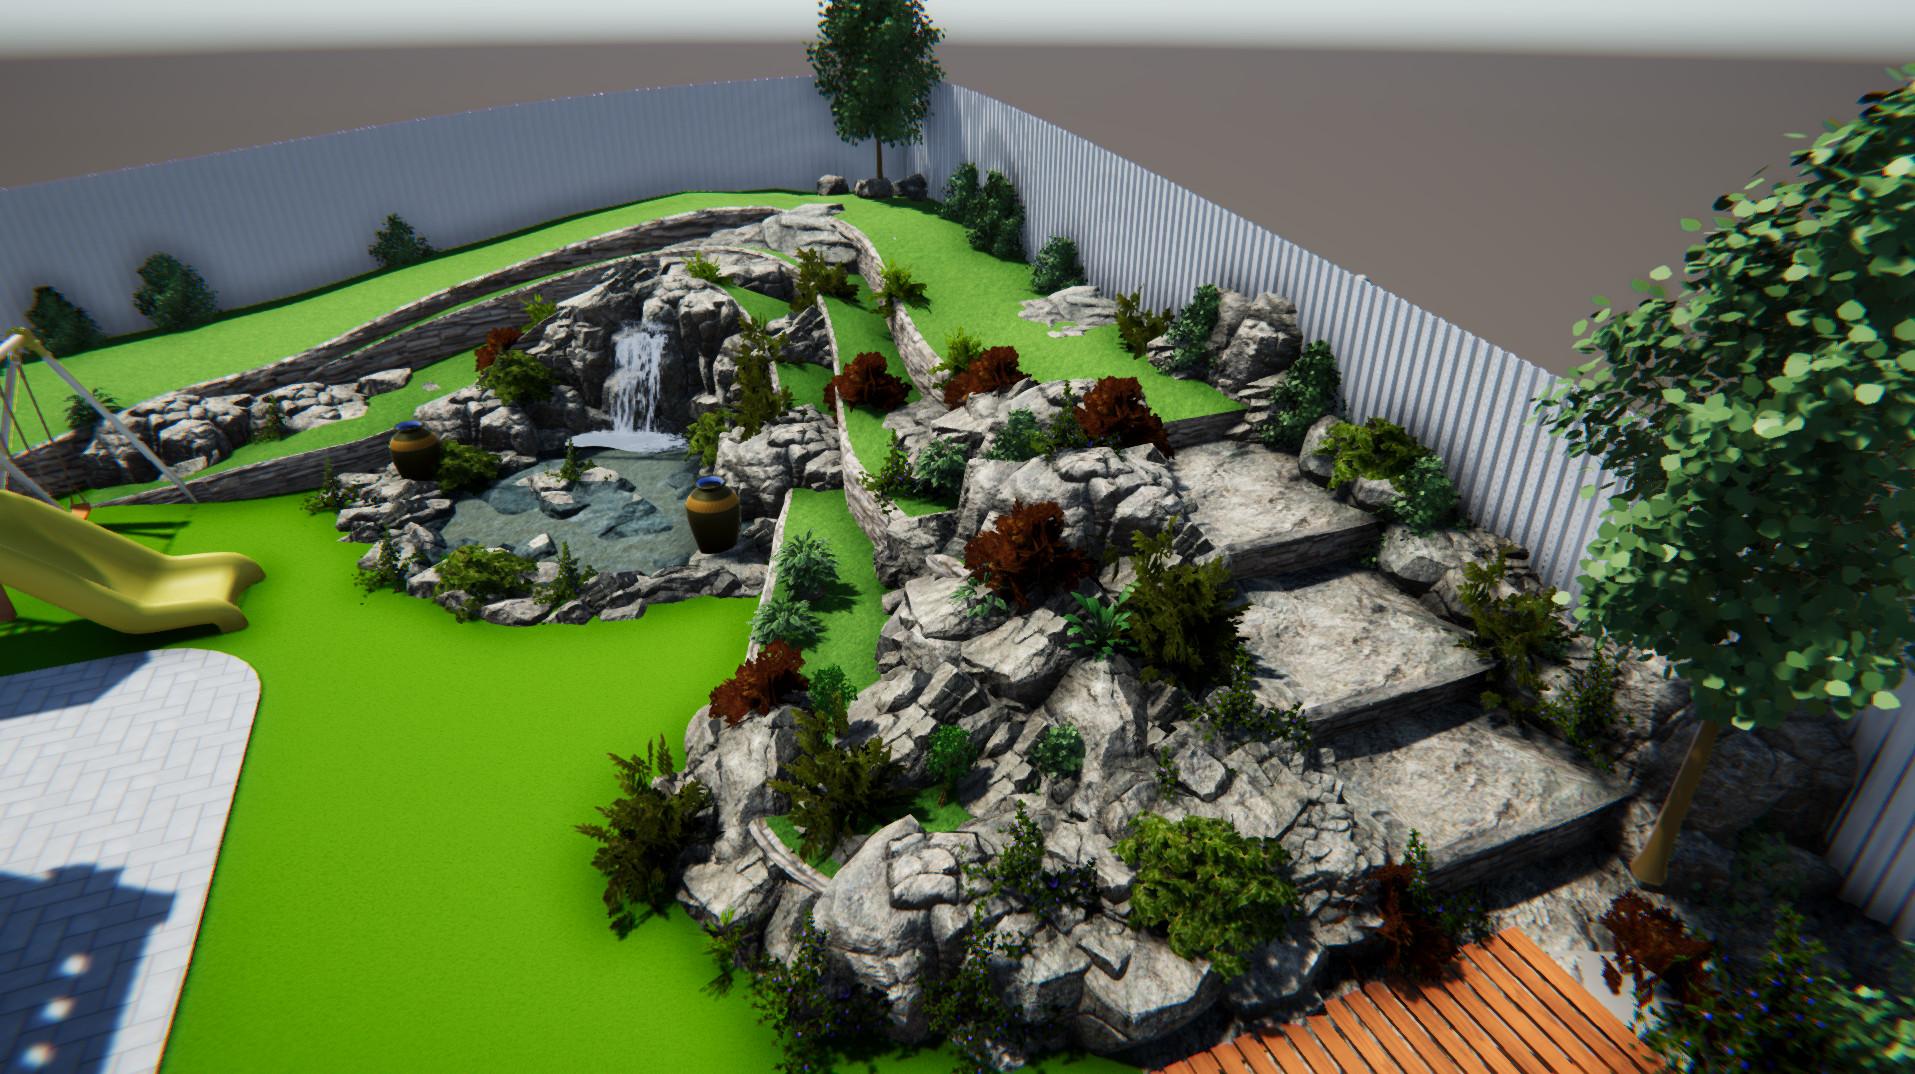 Ландшафтный дизайн участка 10 соток фото f_344598b6f8390894.jpg